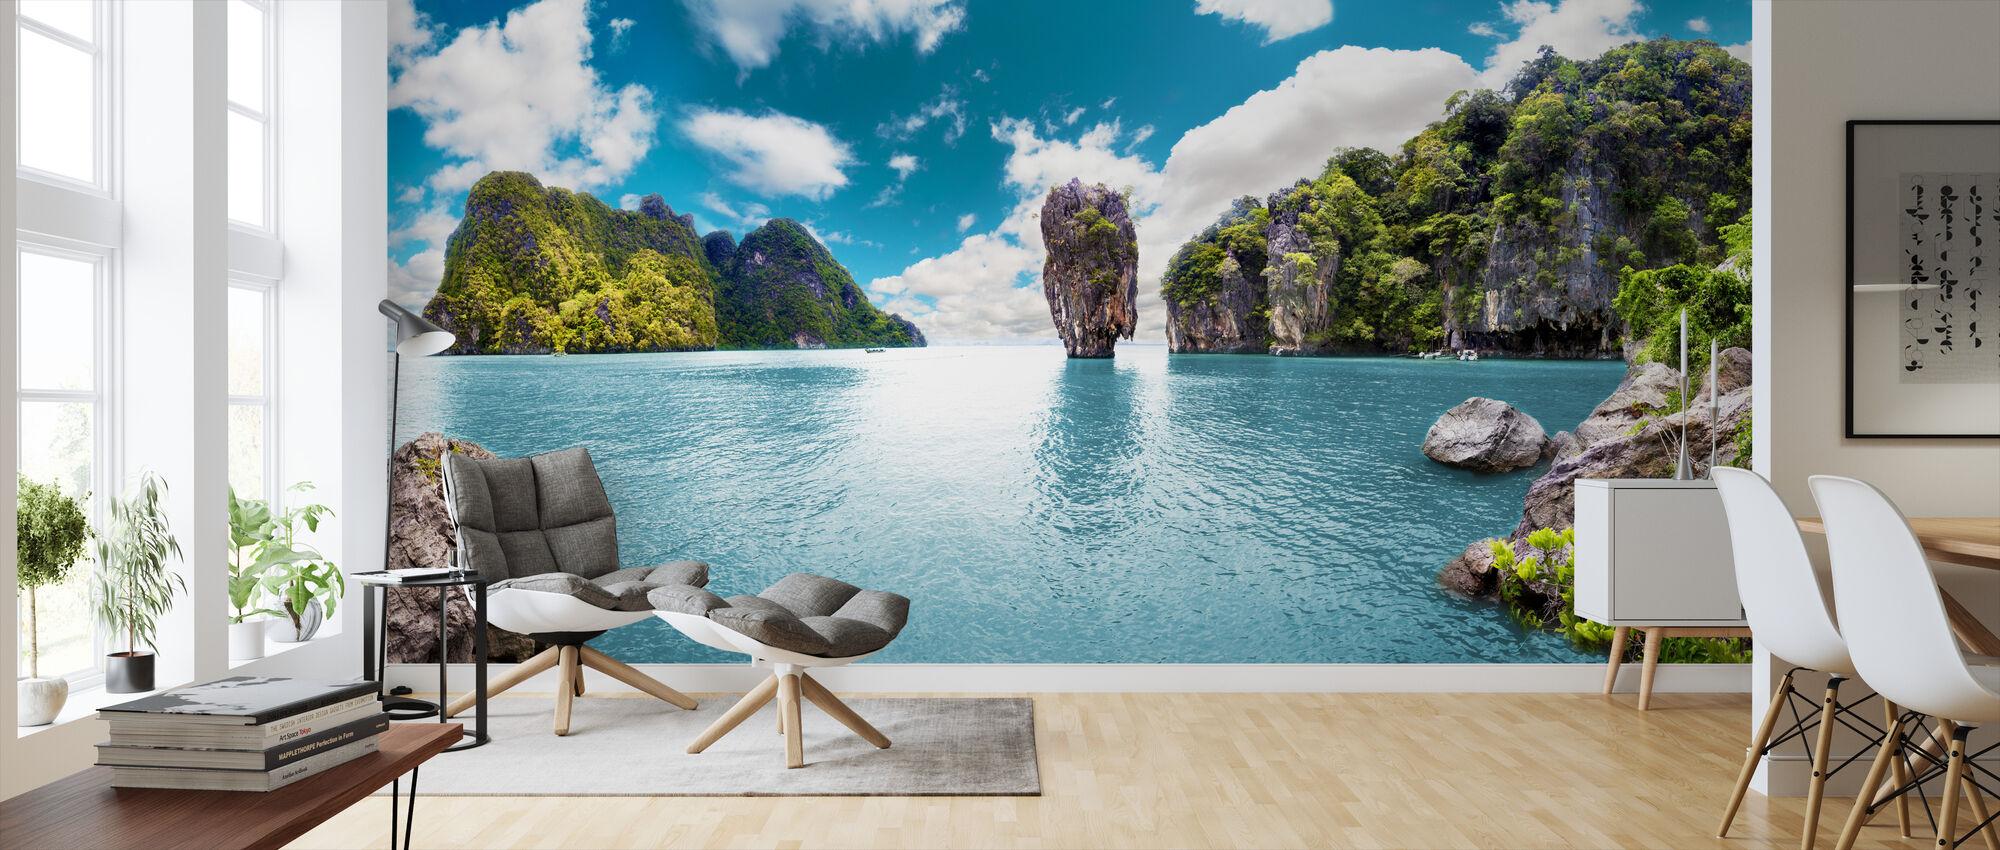 Island Seascape - Wallpaper - Living Room